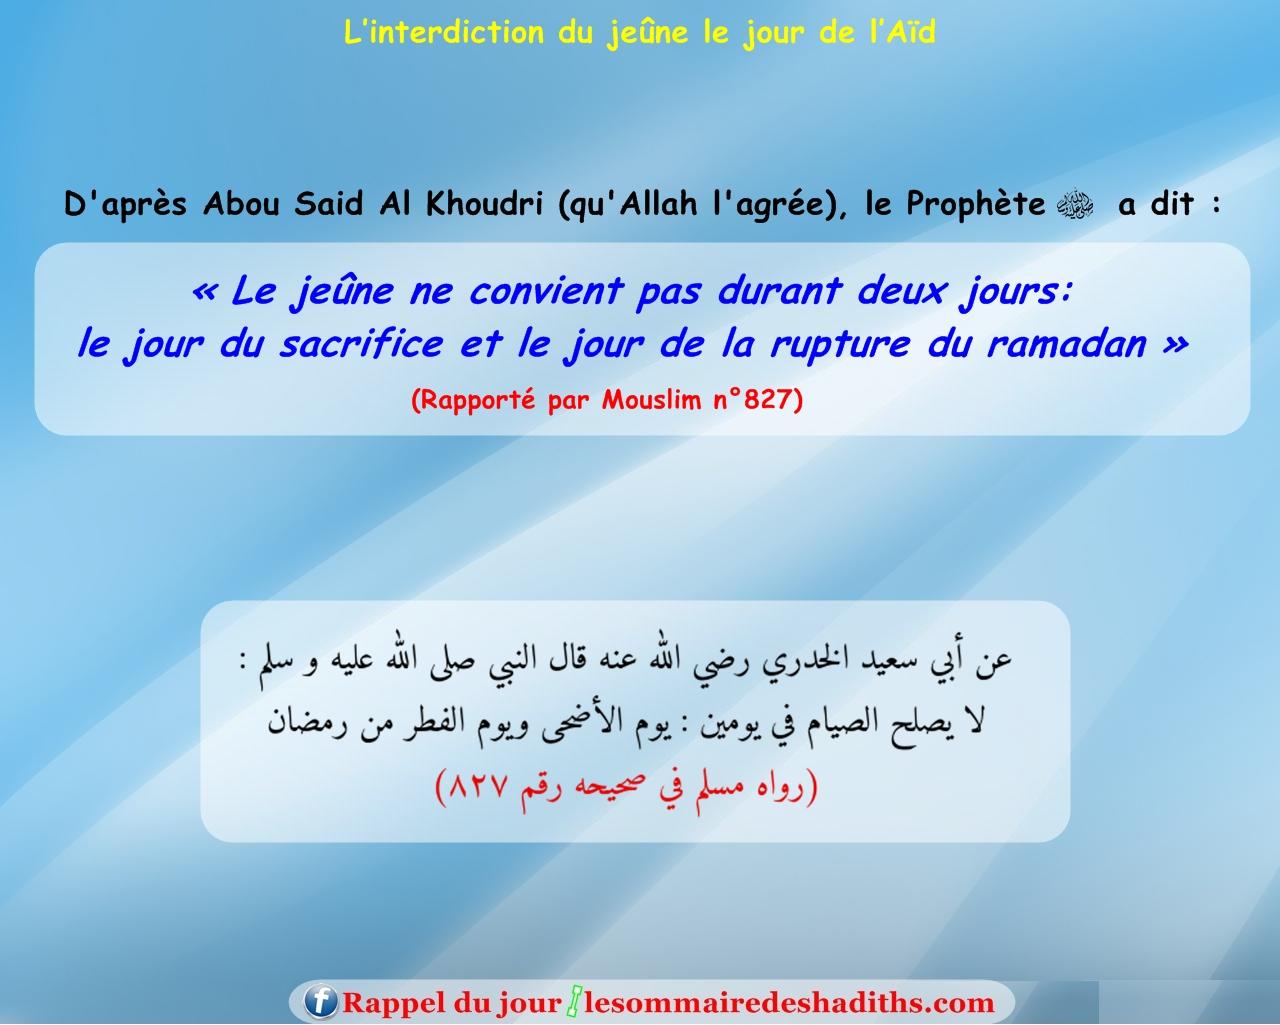 L'interdiction du jeûne le jour de l'Aïd (Abu Sa'id Al-Khudri)